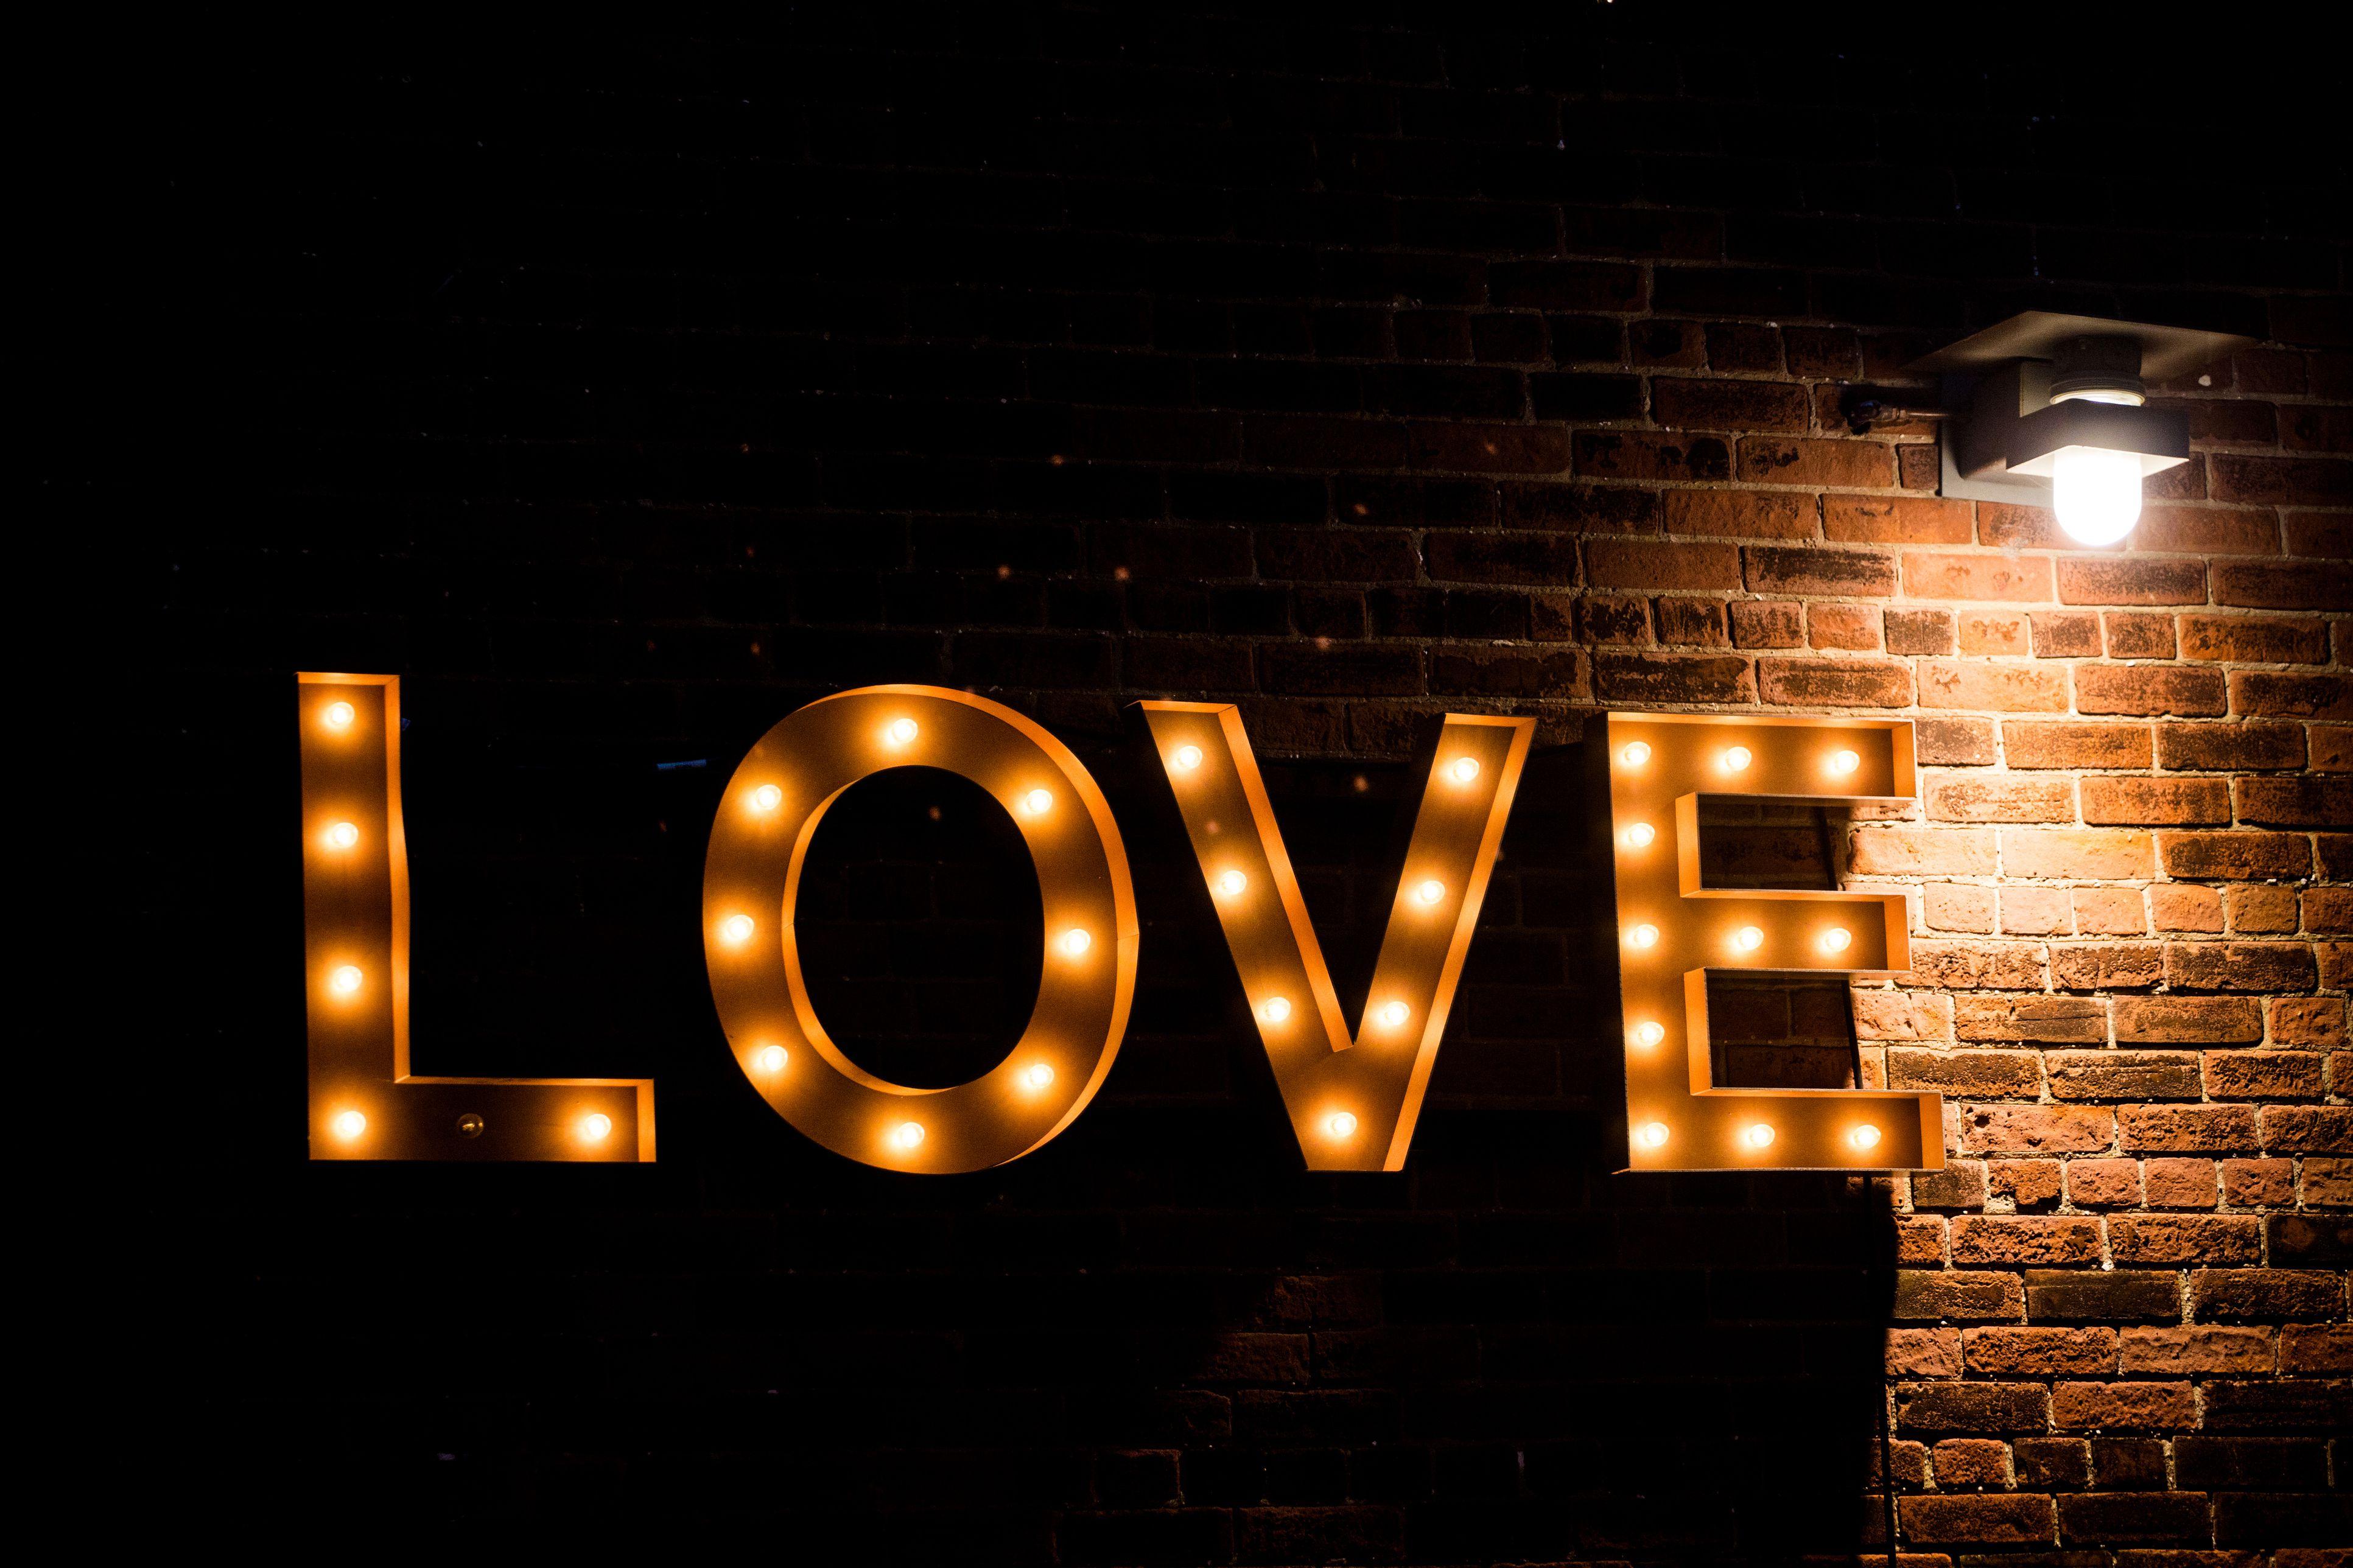 love lightbulb sign on wall